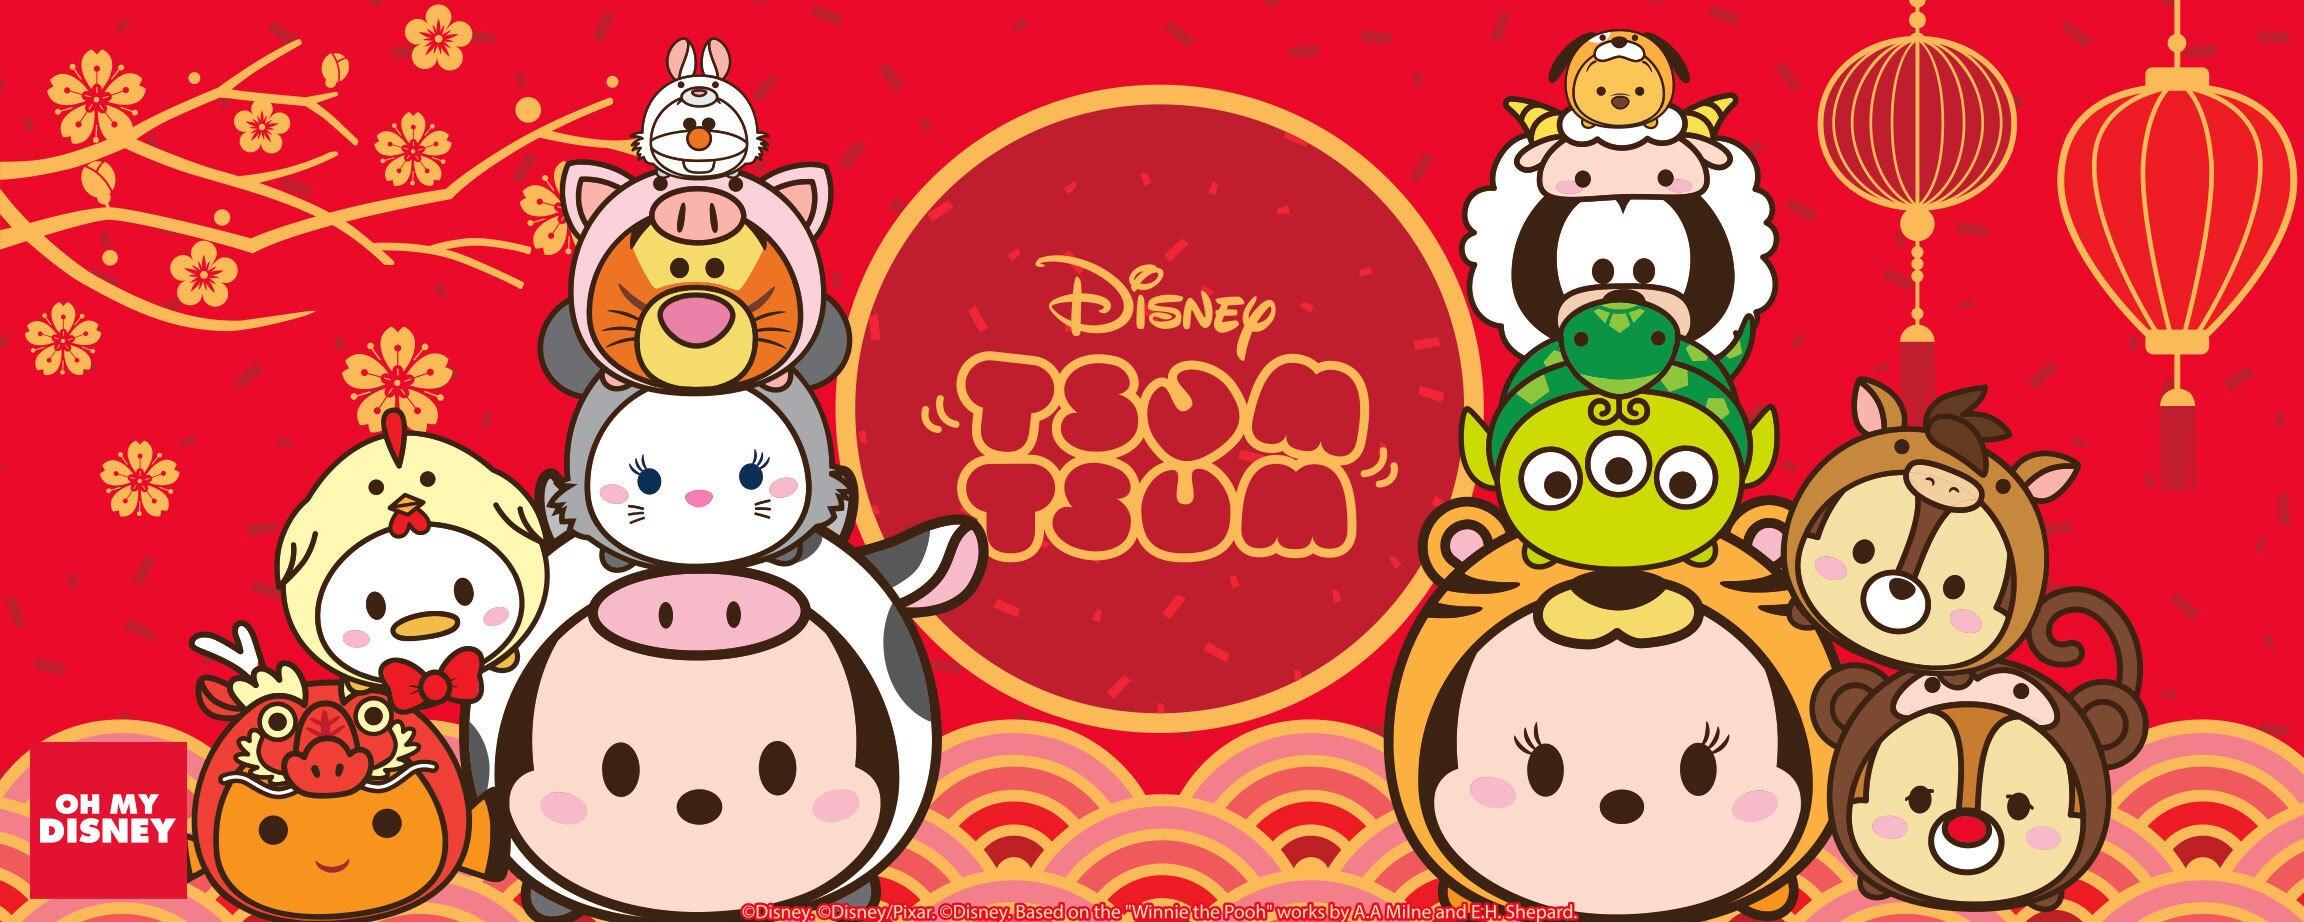 Disney Tsum Tsum Zodiac